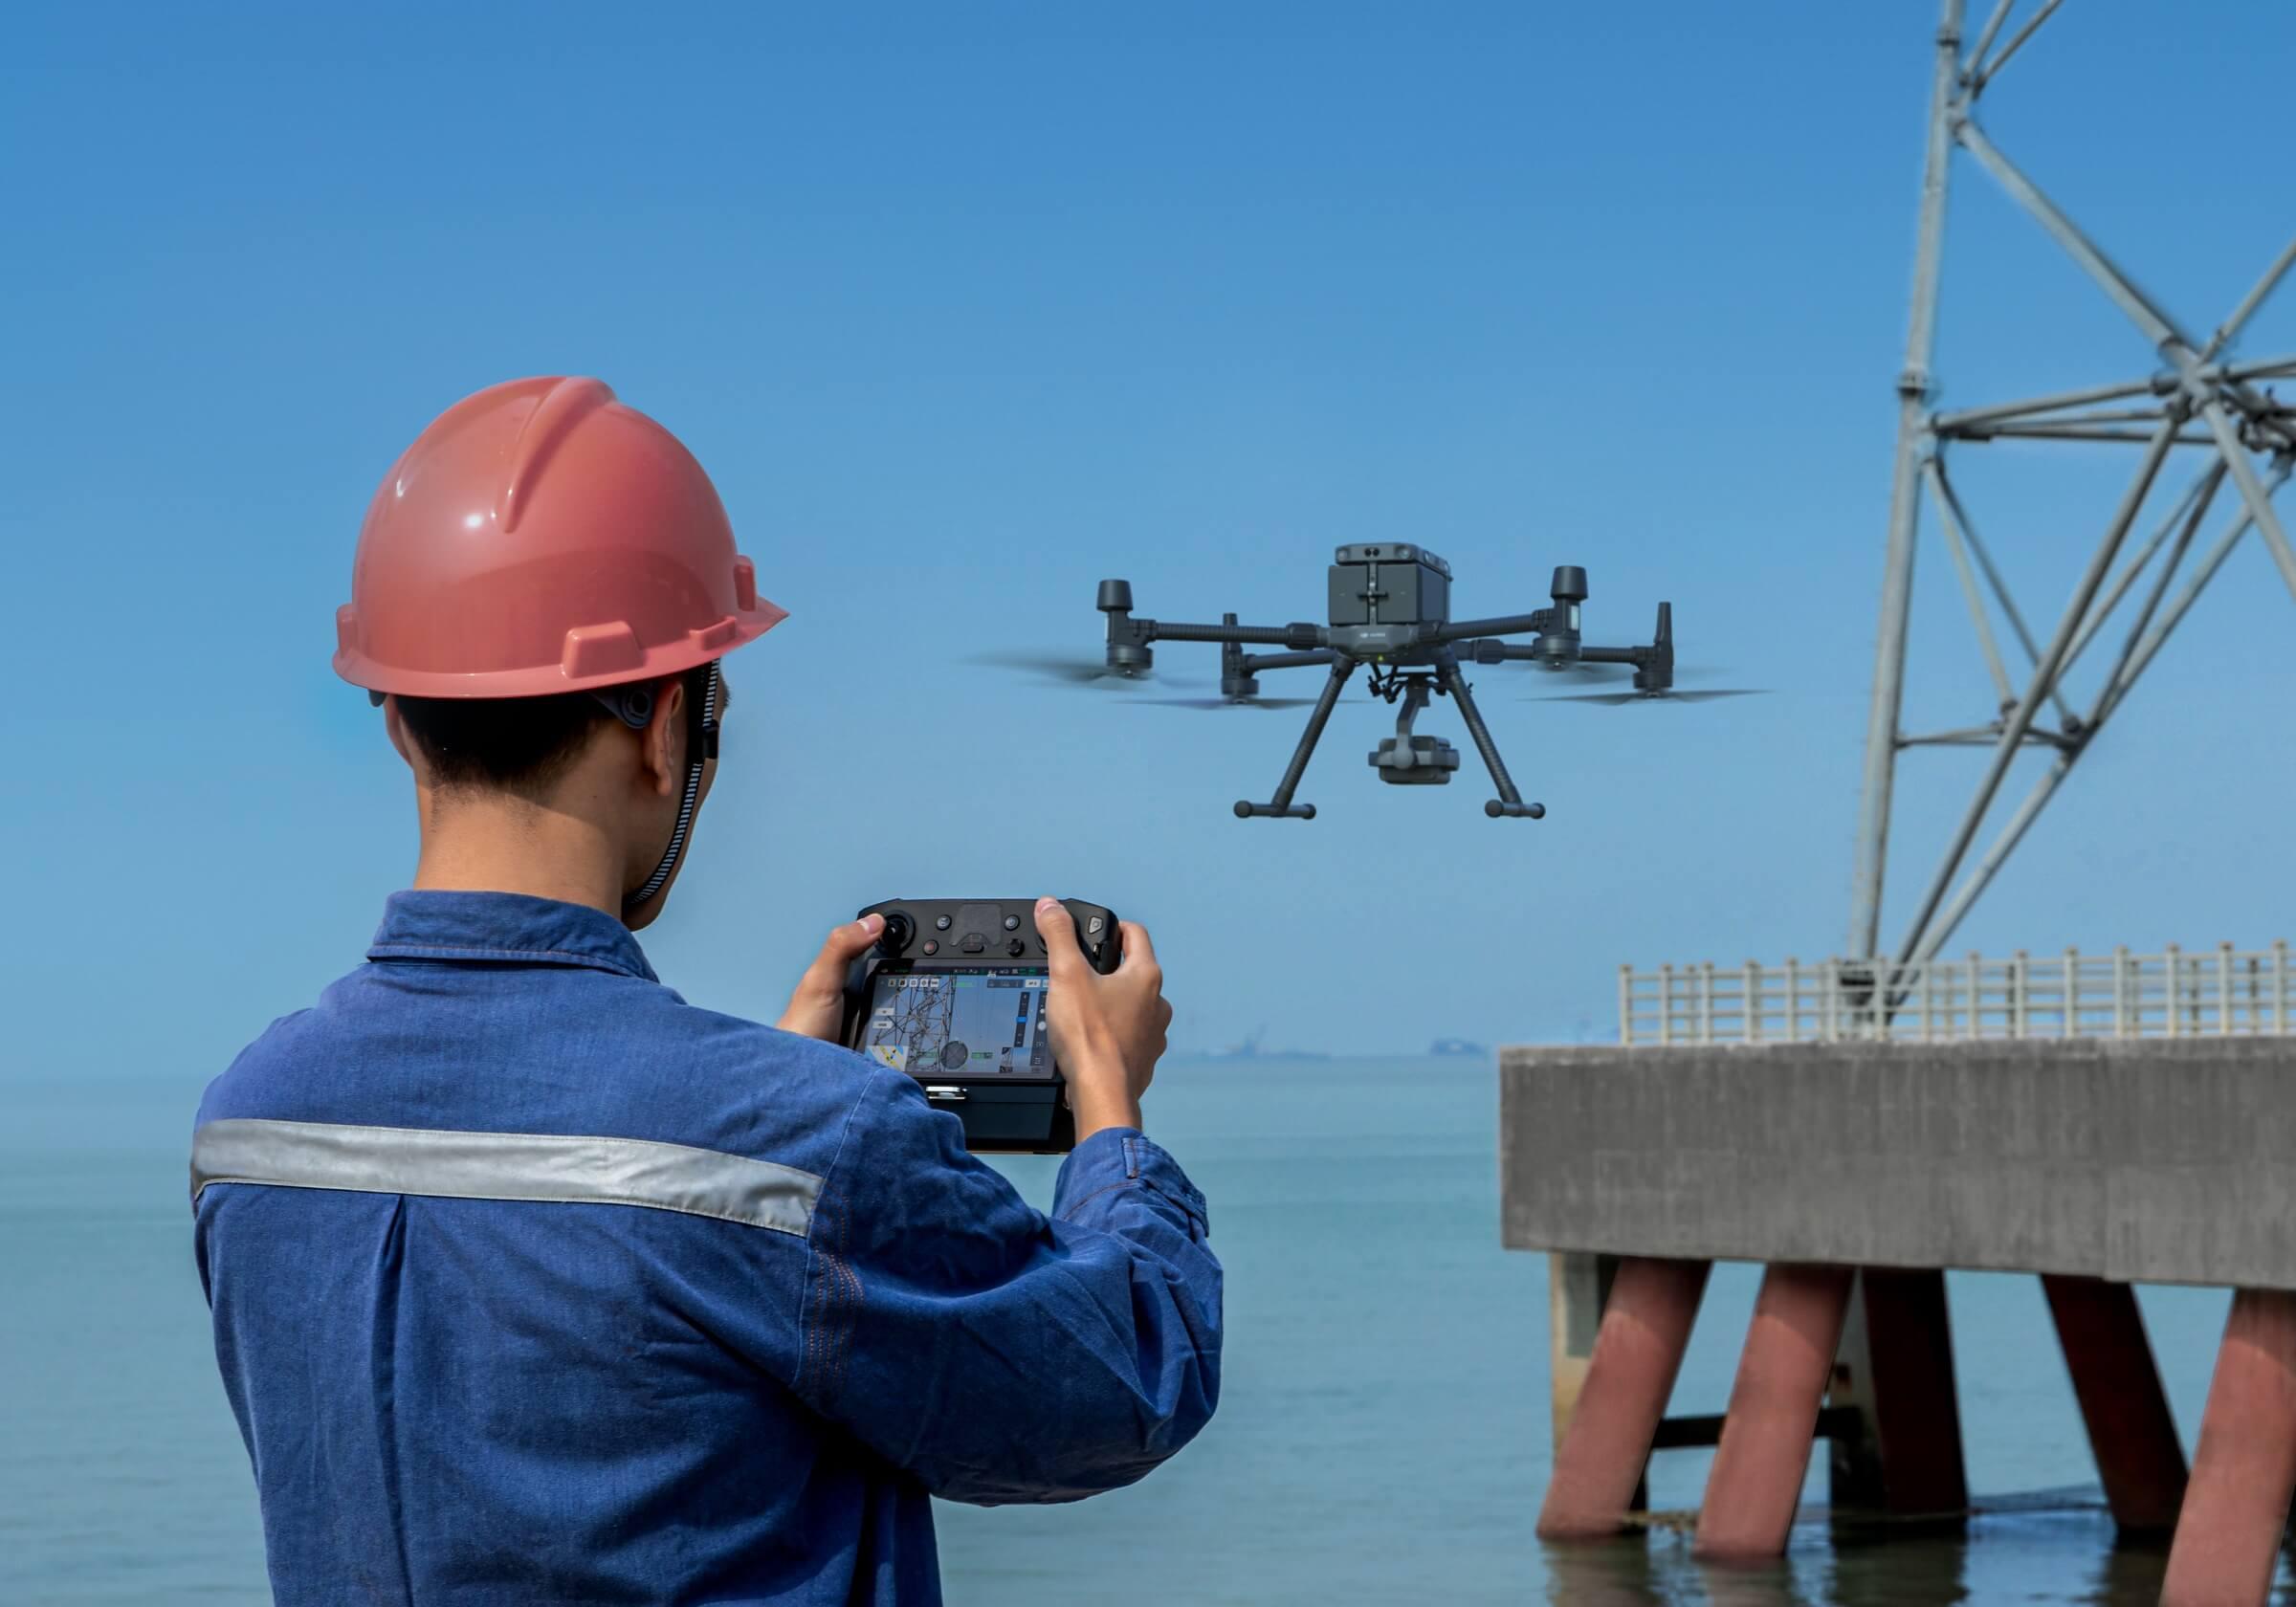 drona-dji-matrice-300-rtk